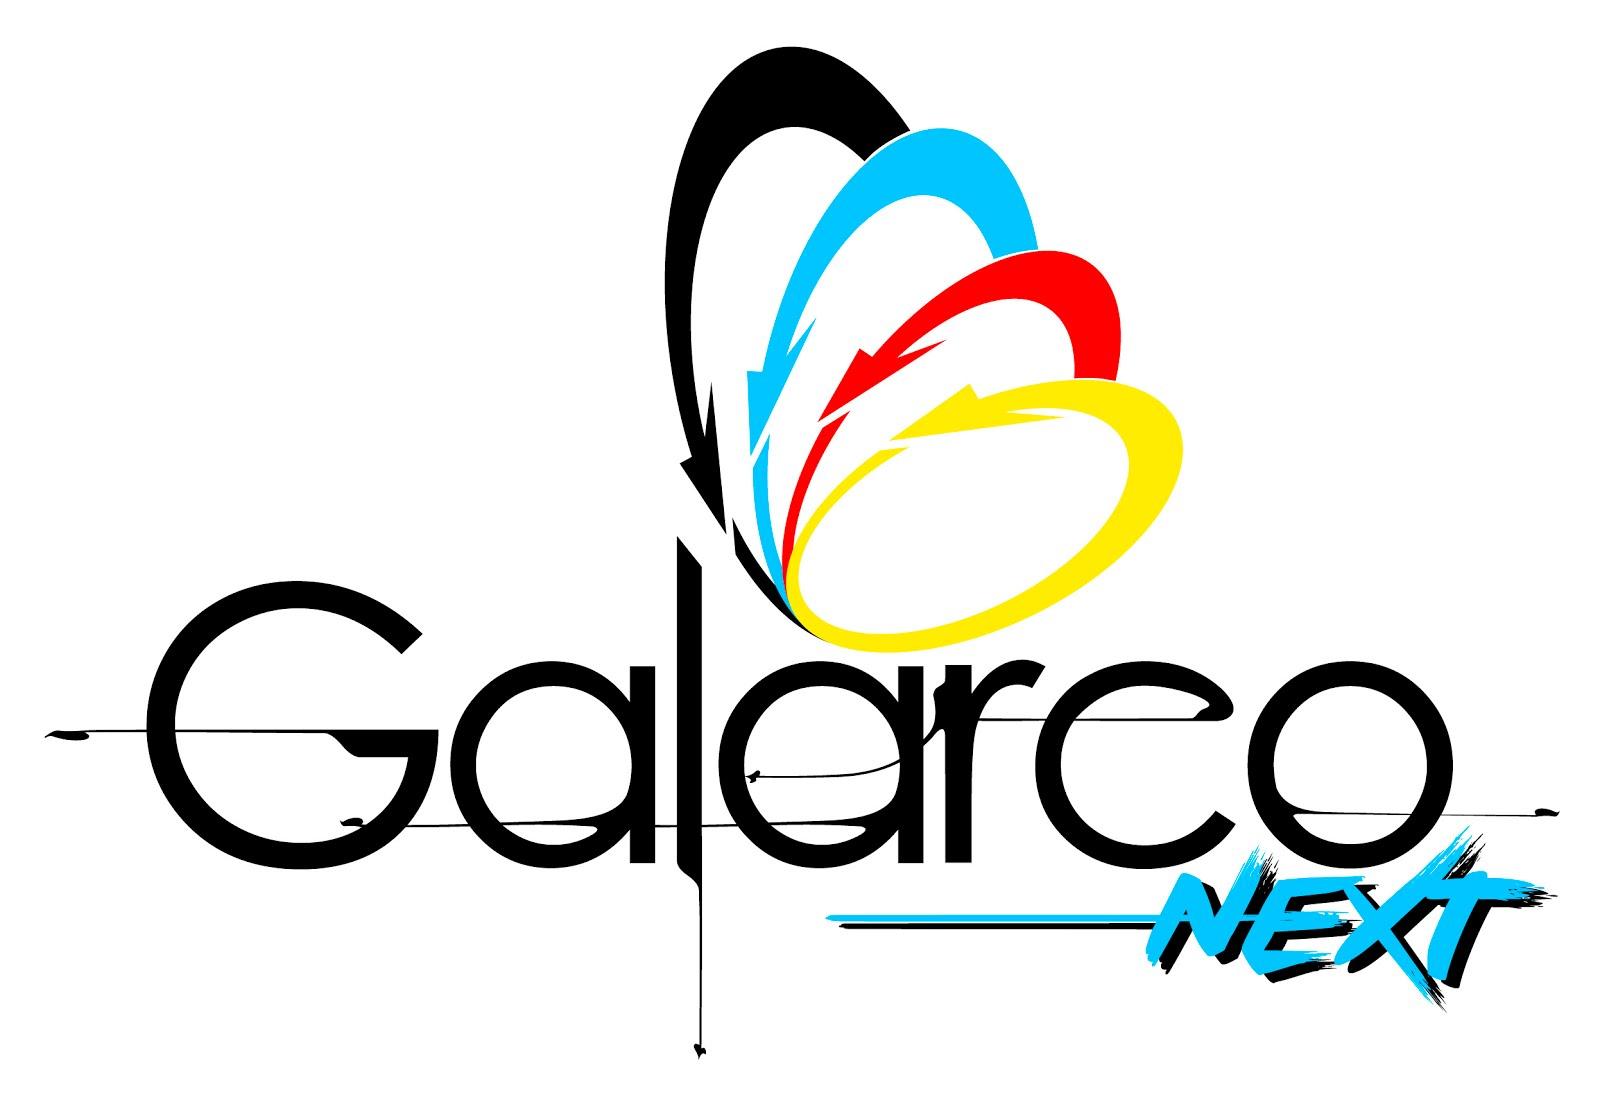 WEB DE LA LIGA GALARCO NEXT